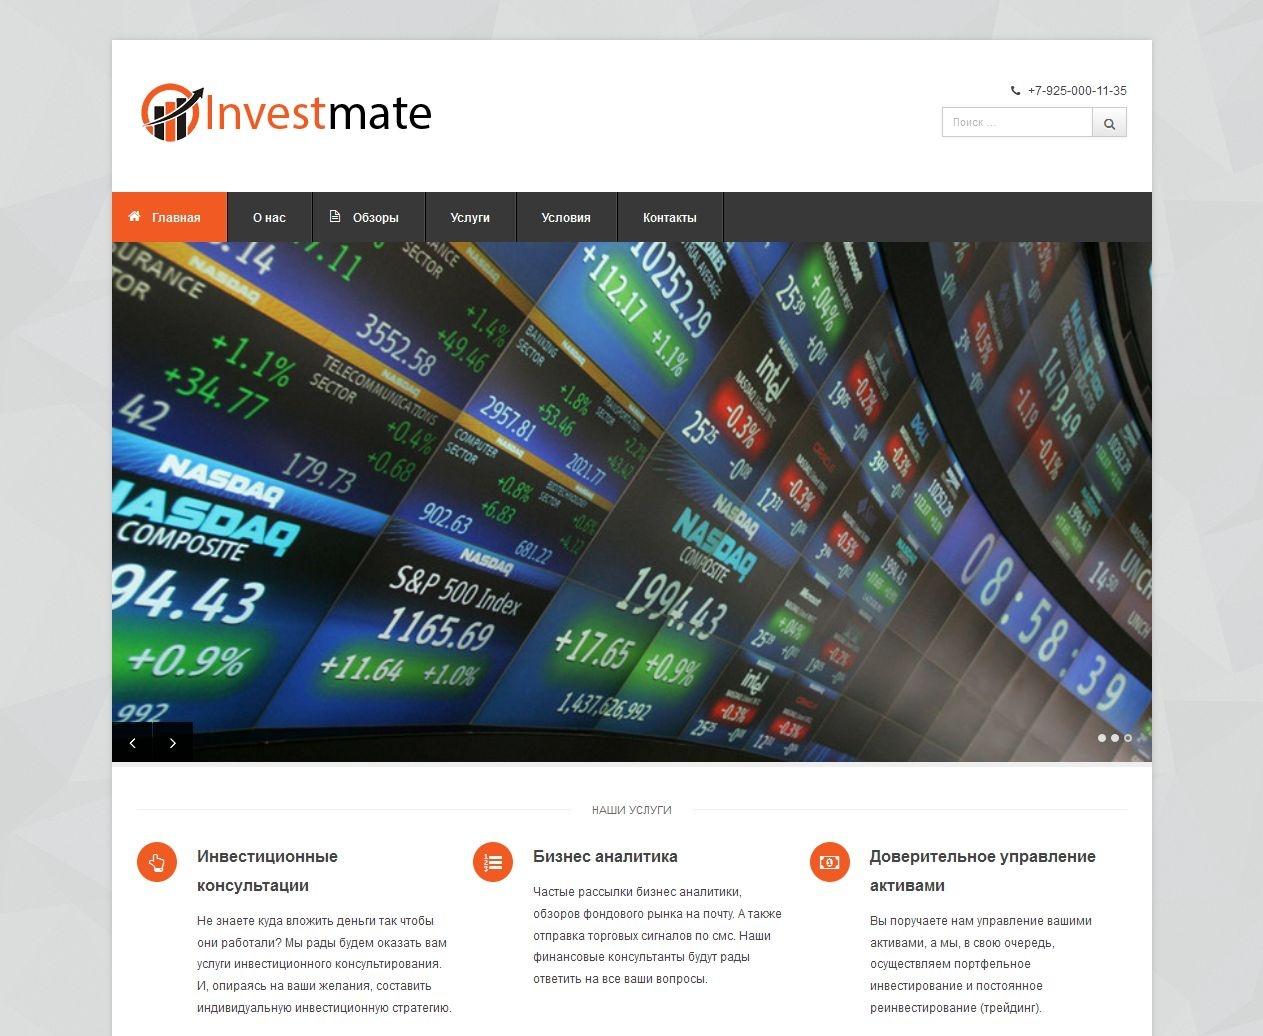 investmate.ru - ваш финансовый консультант